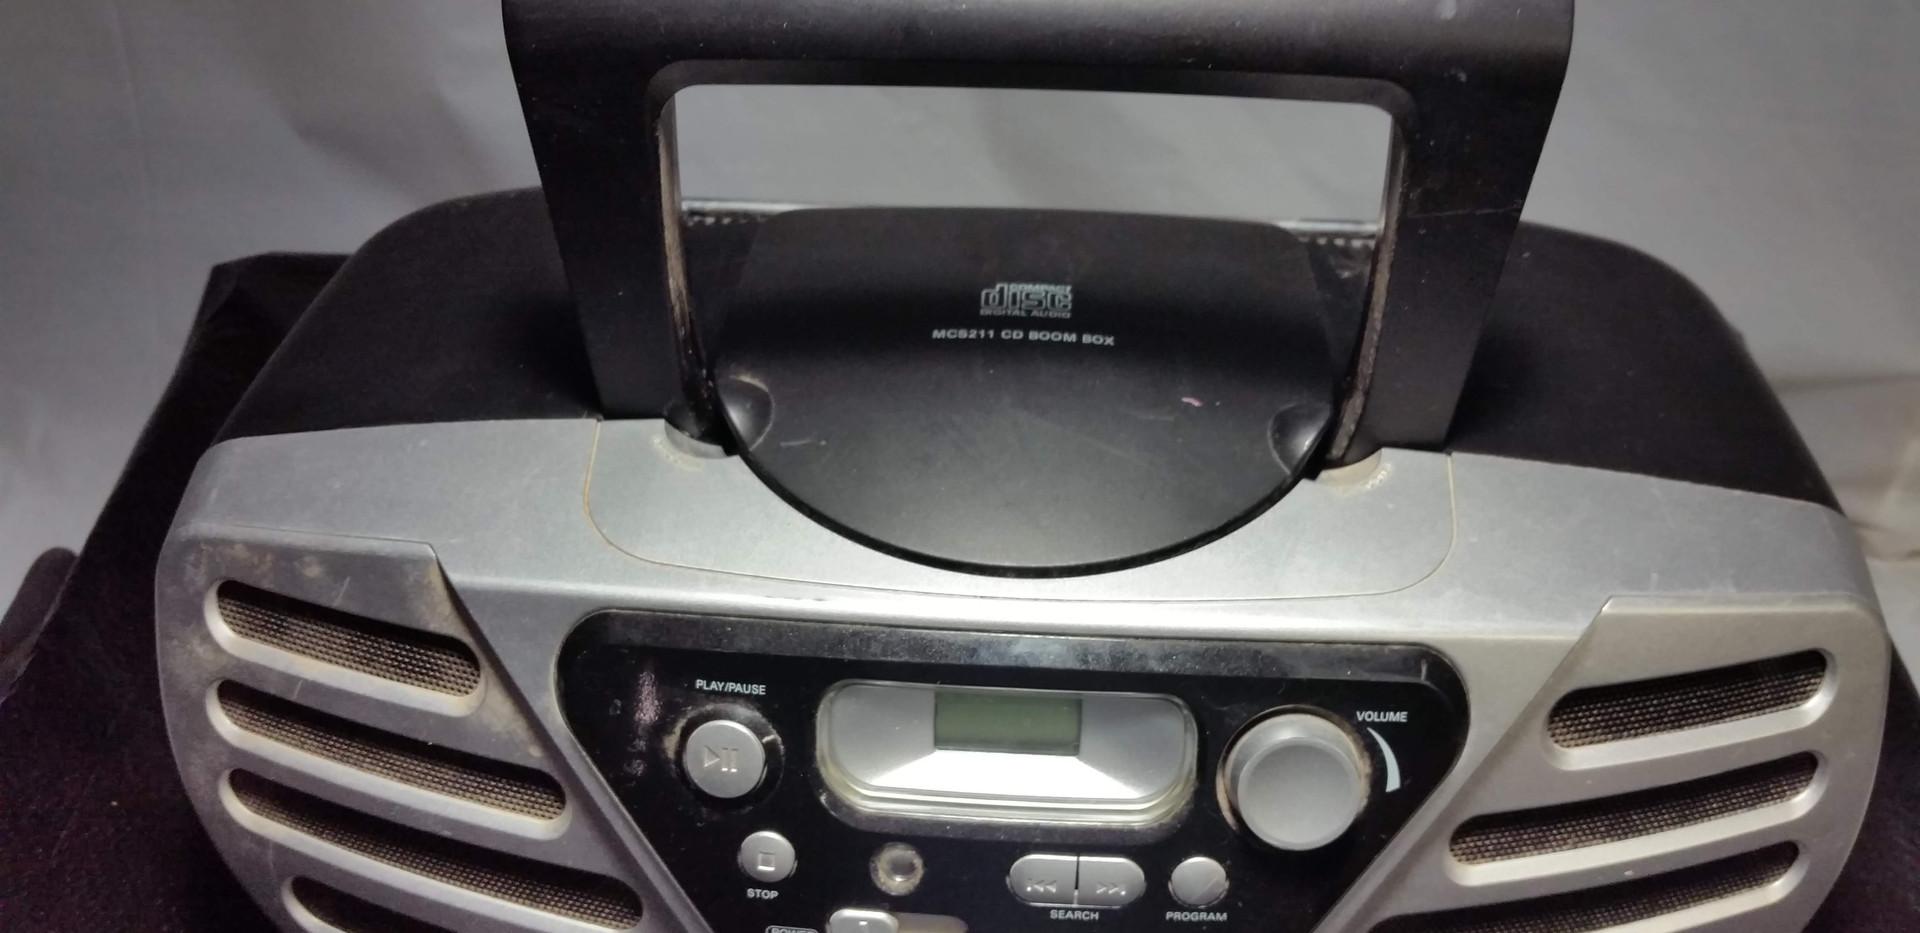 Magnavox Mini Boombox